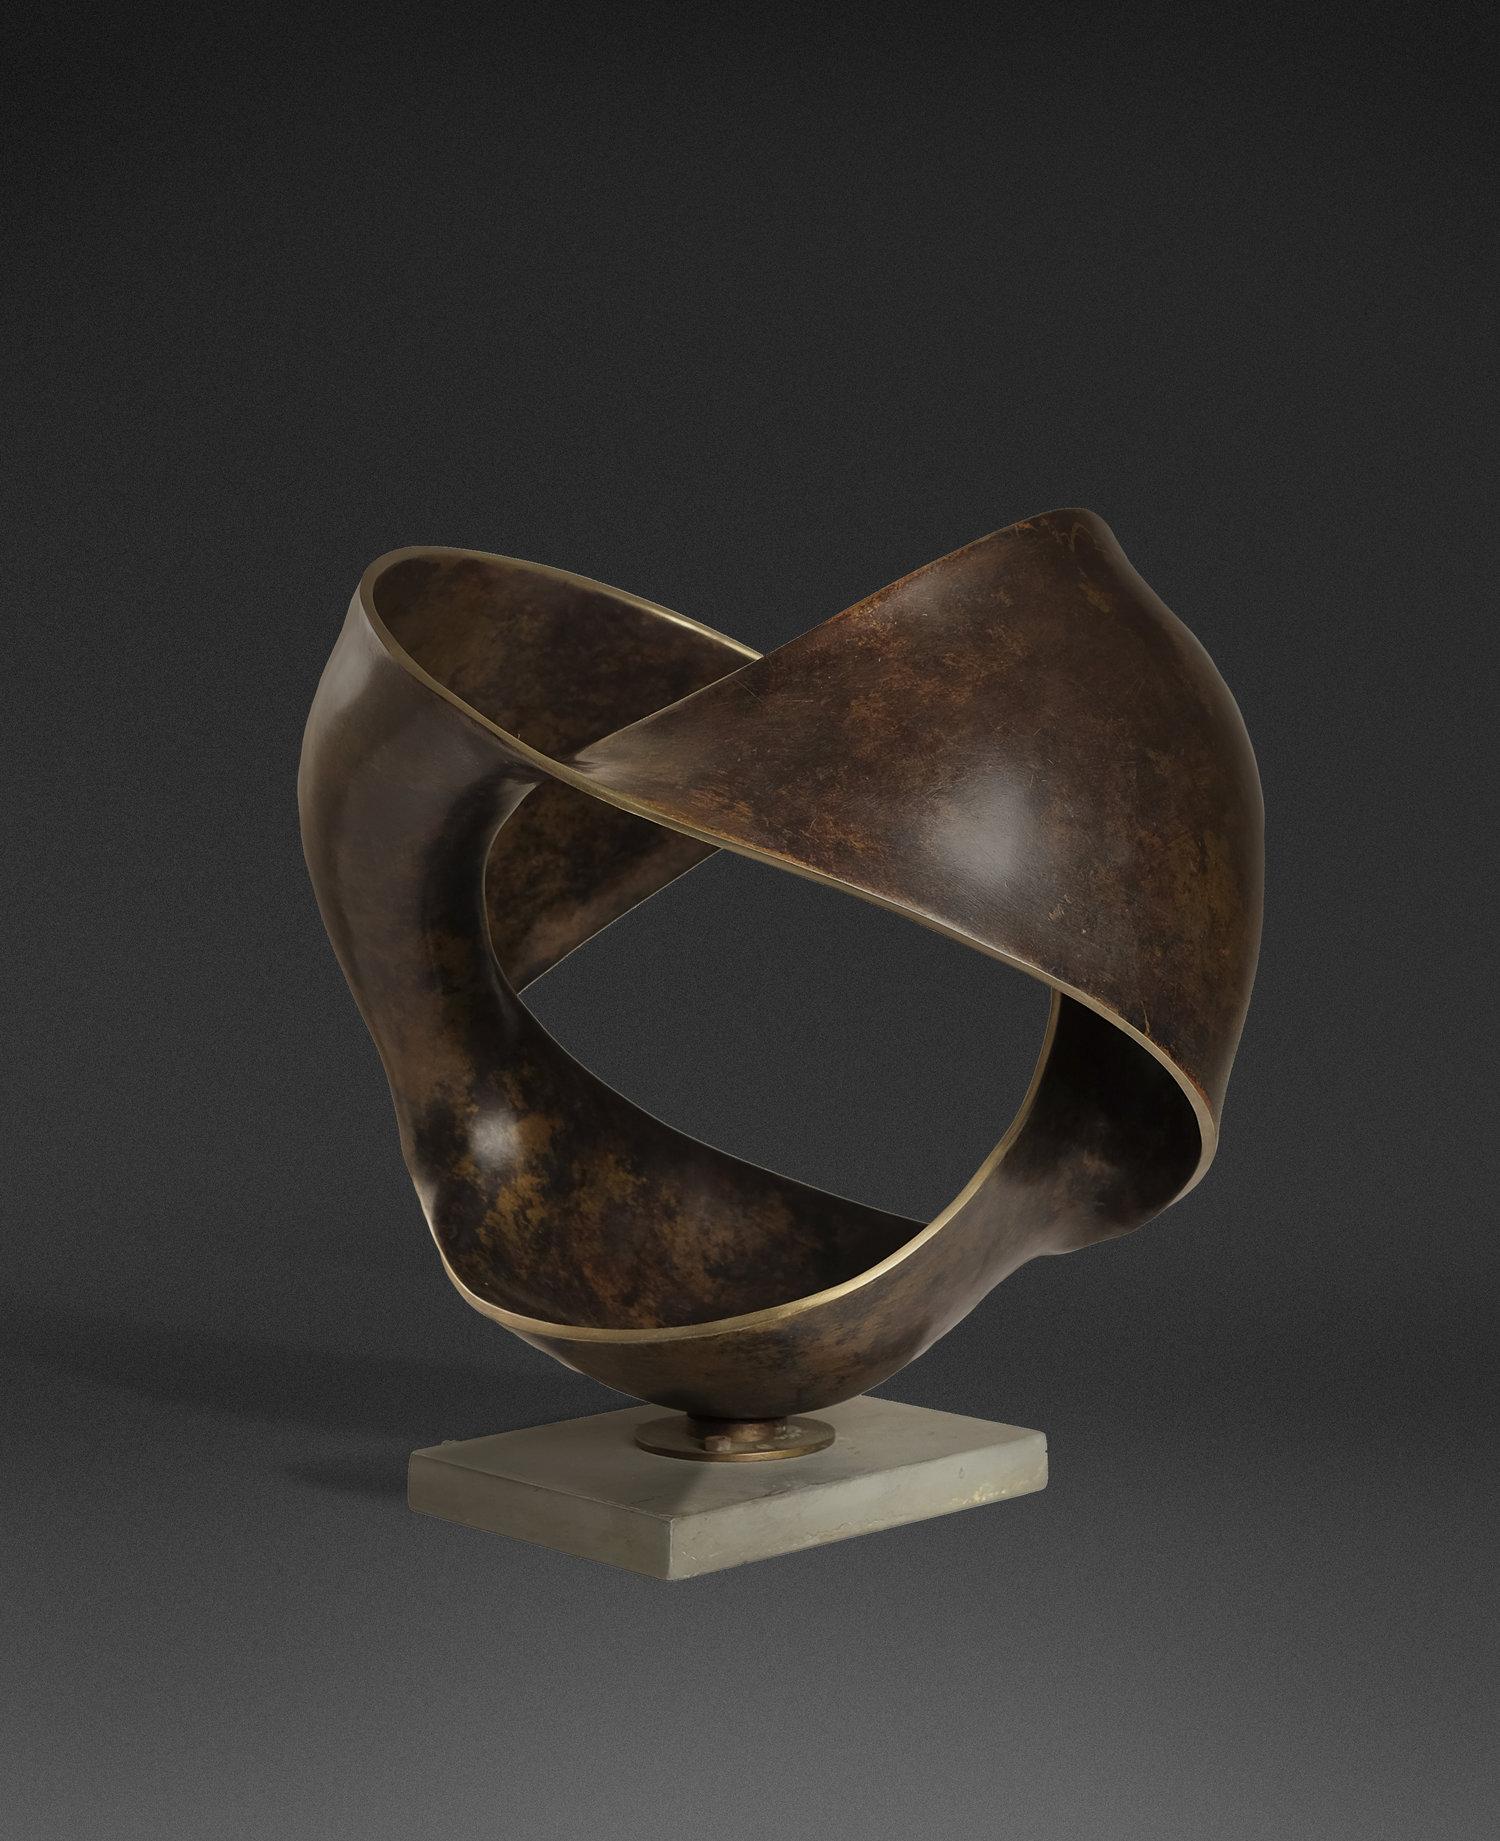 Ahmad Osni Peii, Poimandra, bronze, 51 x 51 x 51cm, 1995